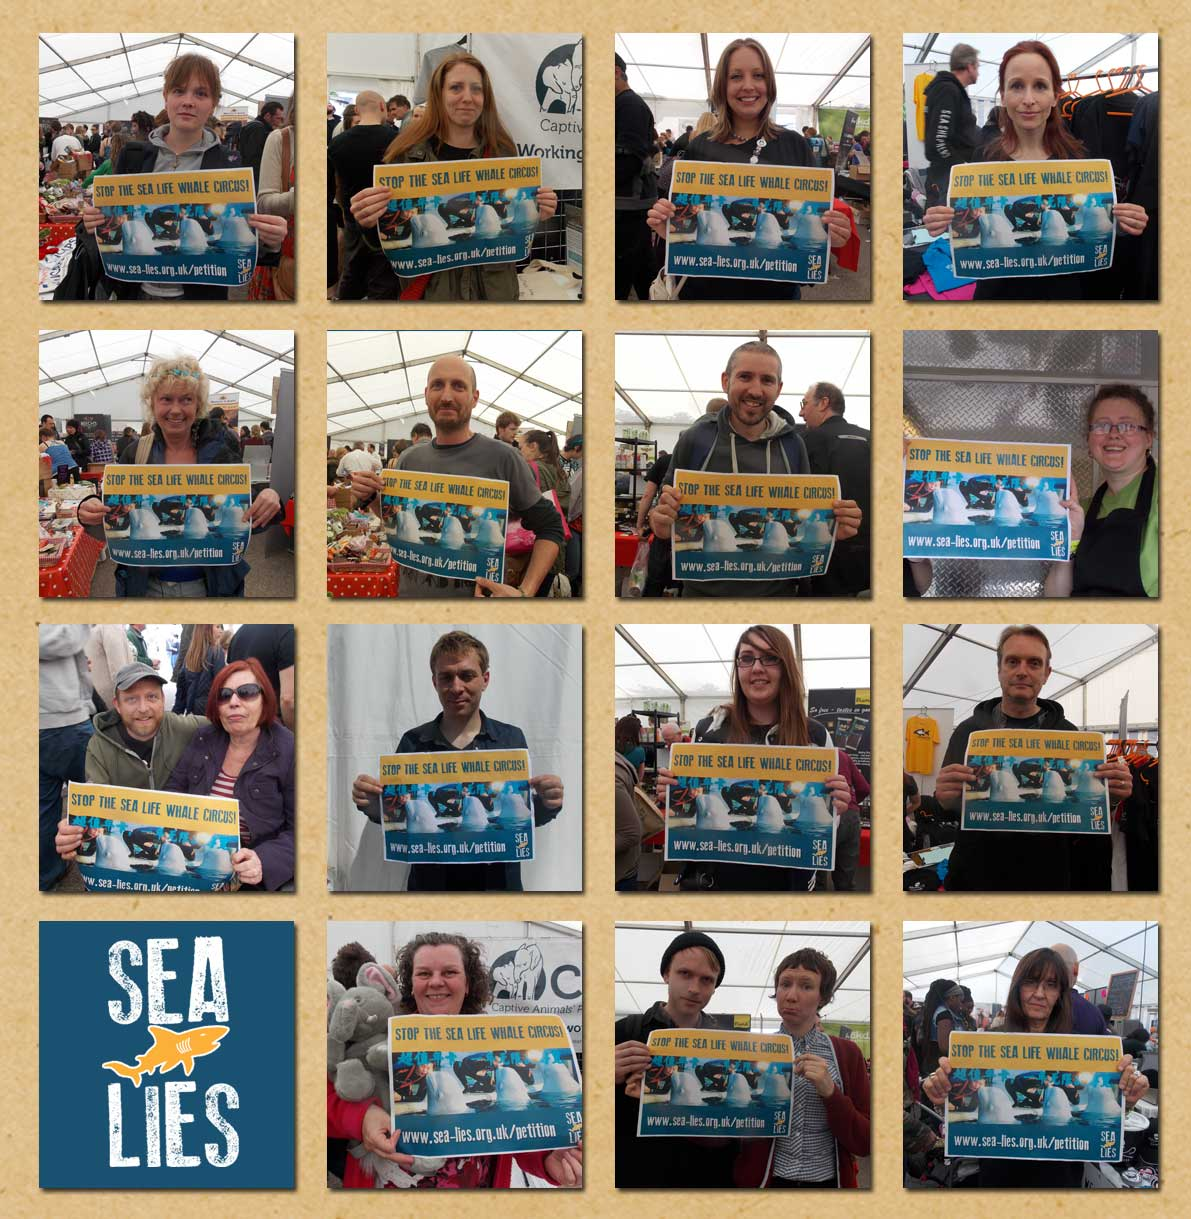 Montage-SEA-LIES